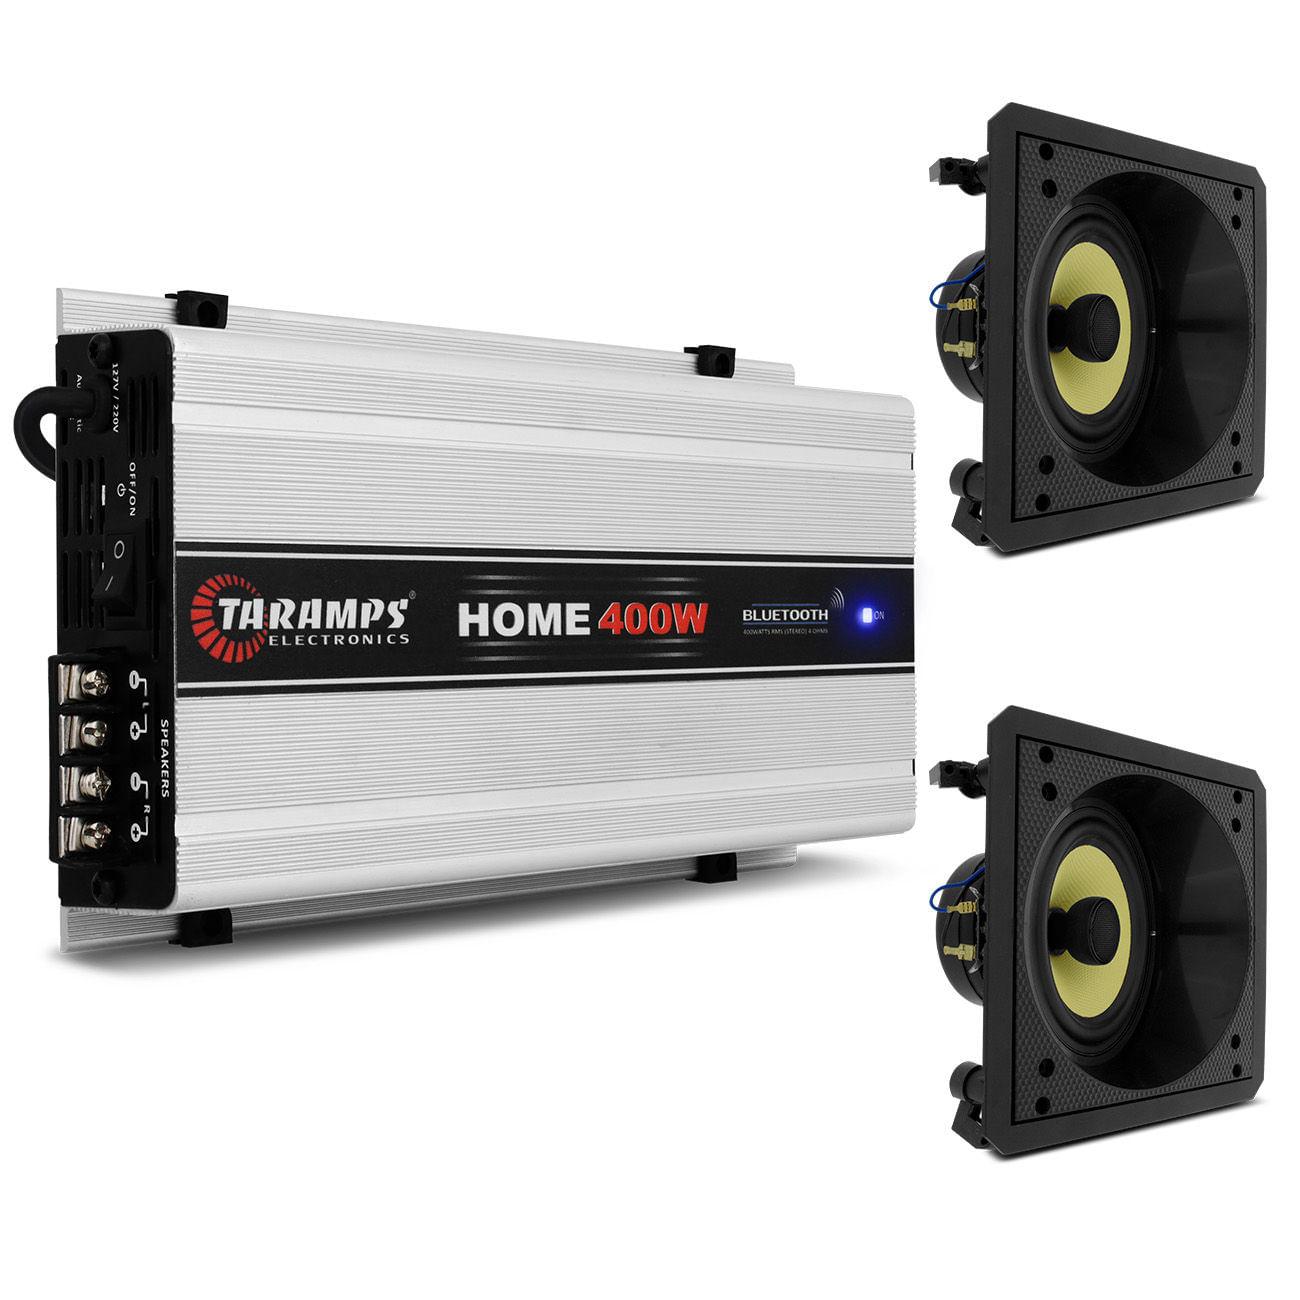 Kit Módulo Amplificador Taramps 400W + 2 Alto Falantes BSA SAX6 Tela Branca Spot Sound